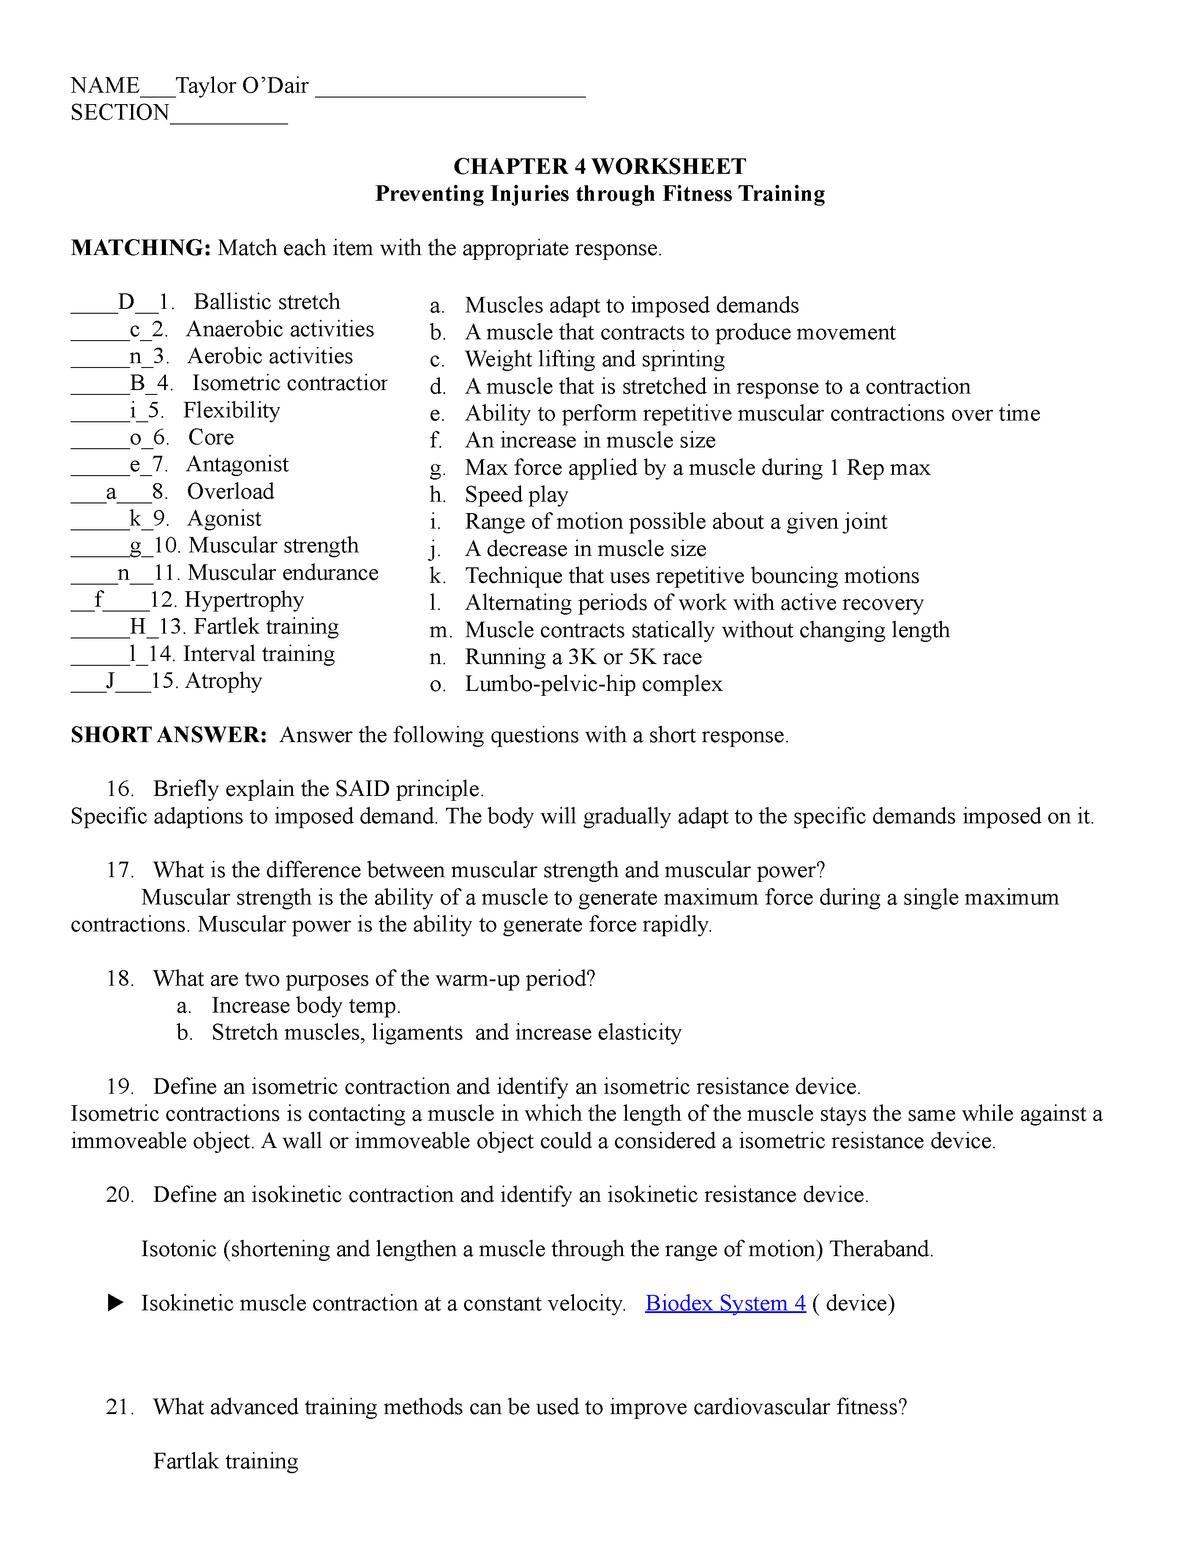 Chapter 4 sport medicine - HS349: Sports Medicine - StuDocu